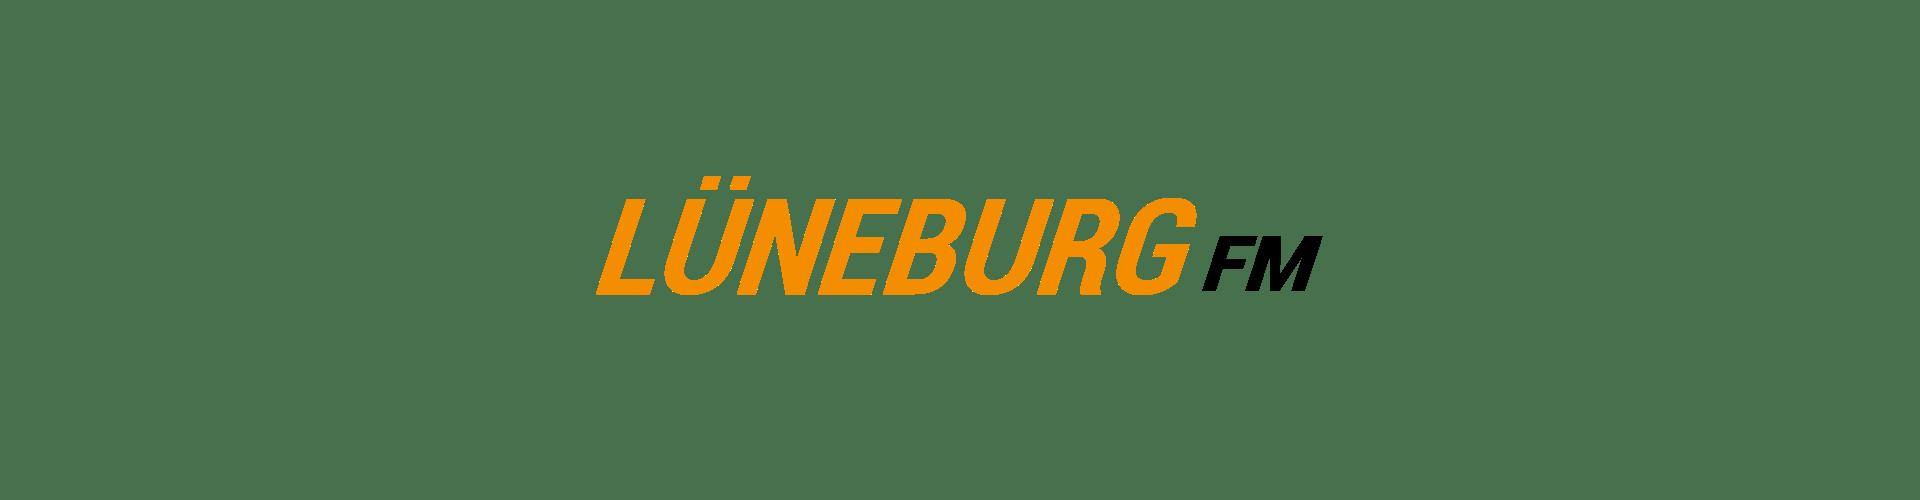 Lüneburg FM